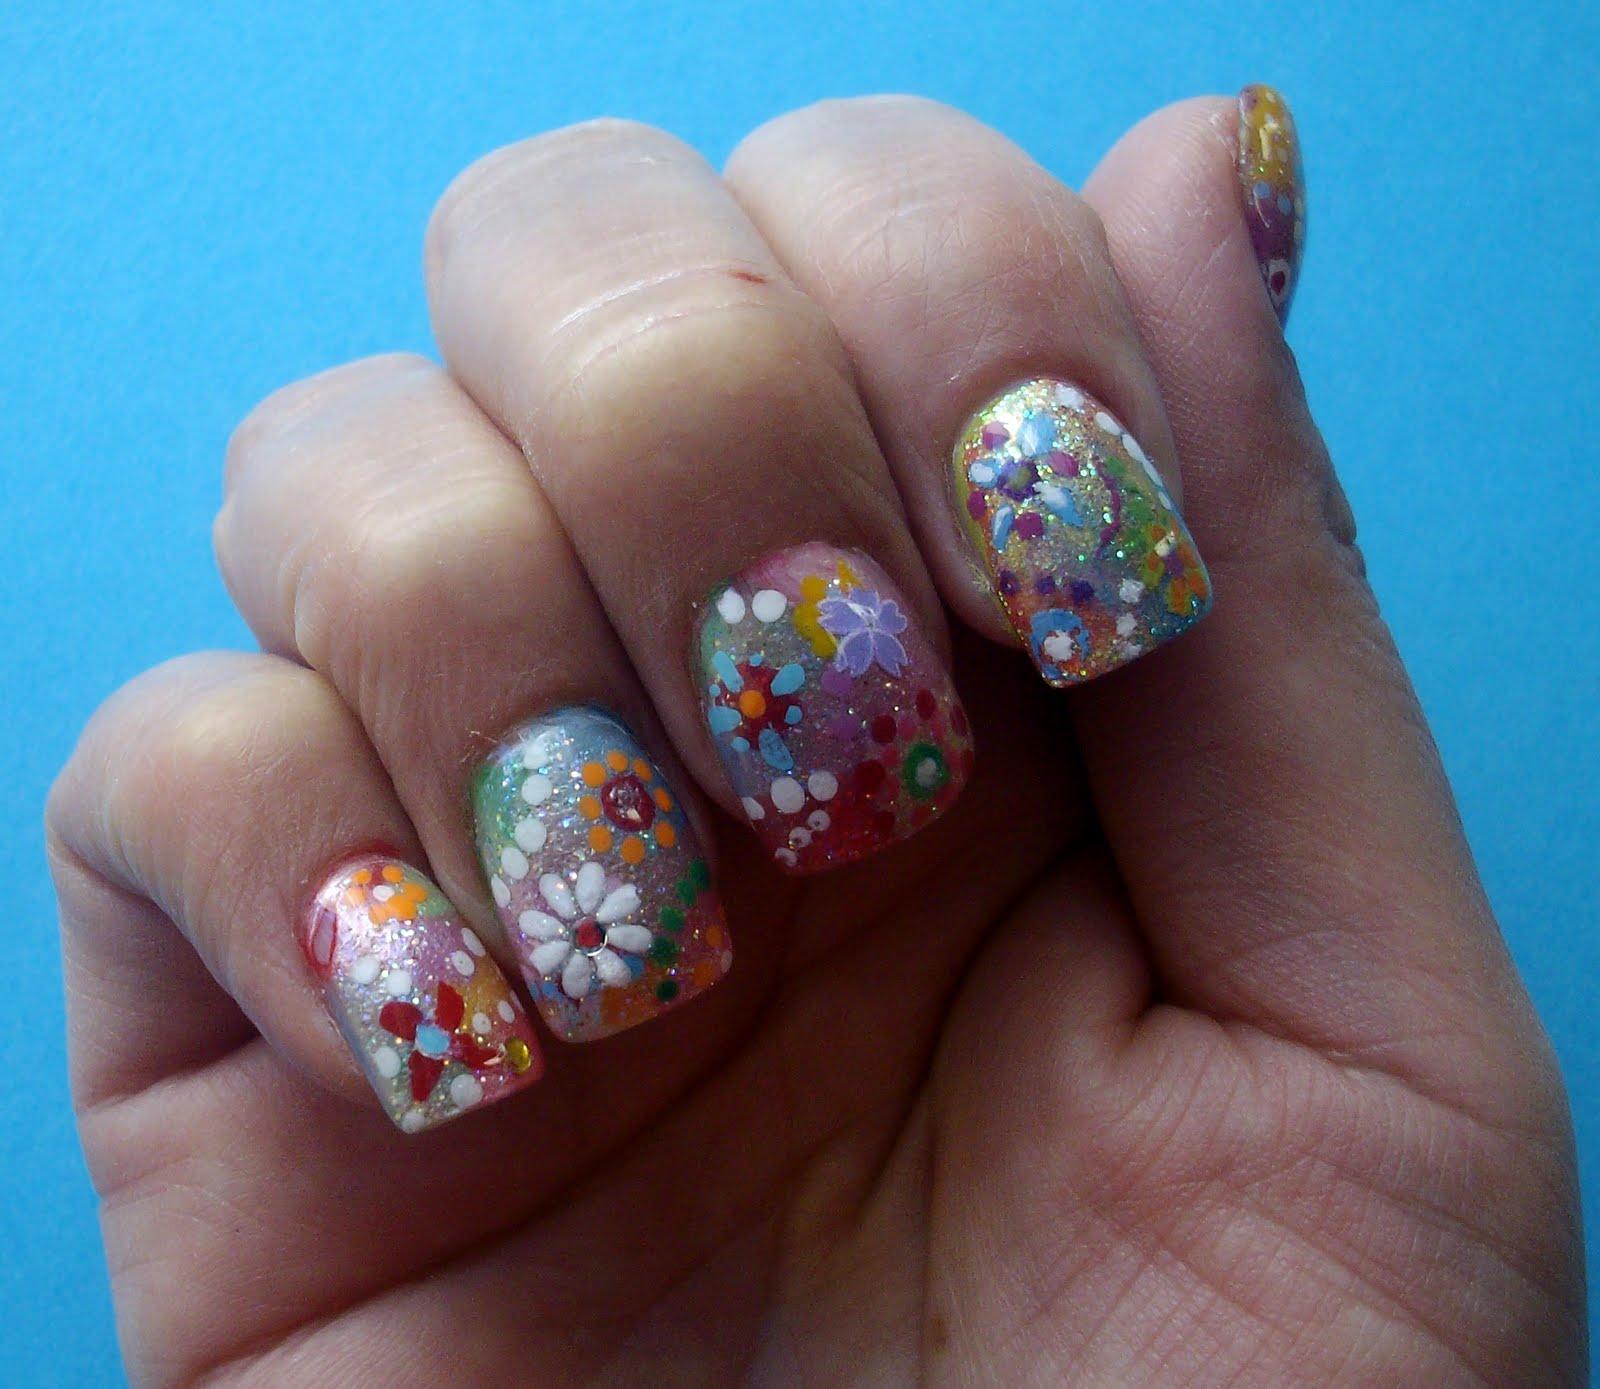 Monkey Inspirations: Colorful Nail Art